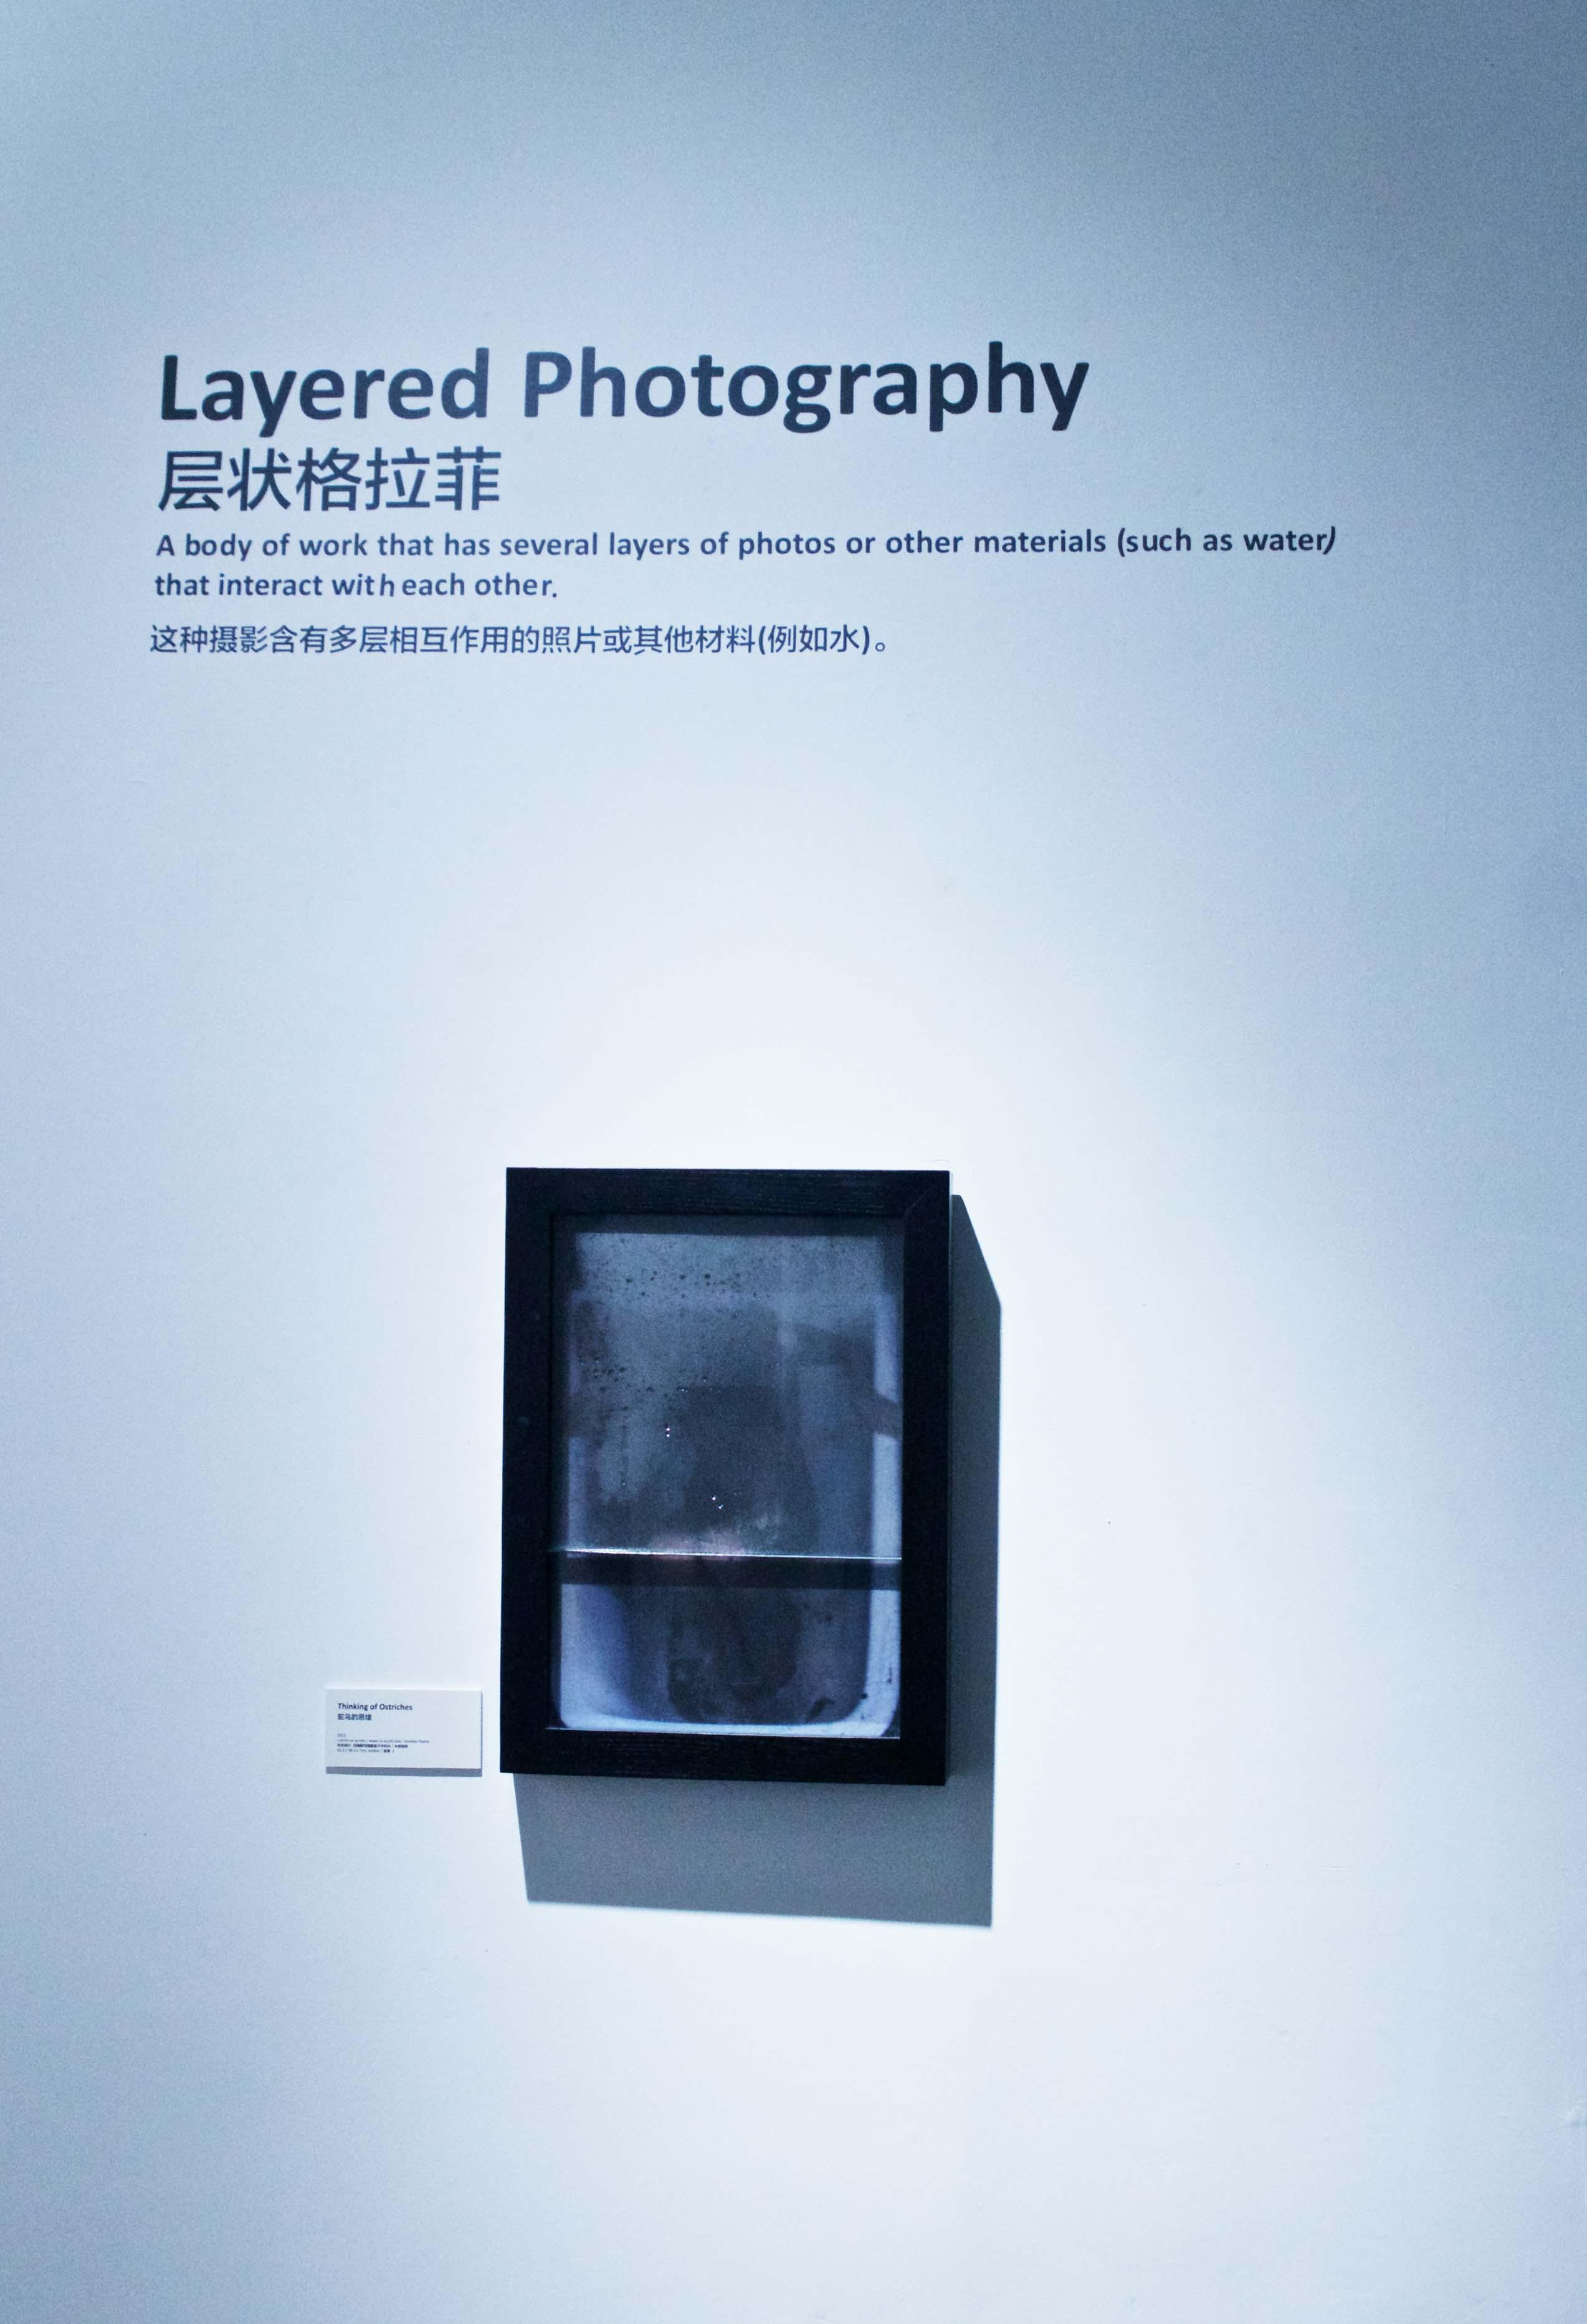 Zane Mellupe Solo Exhibition @ The Bund Art Museum, Shanghai 40